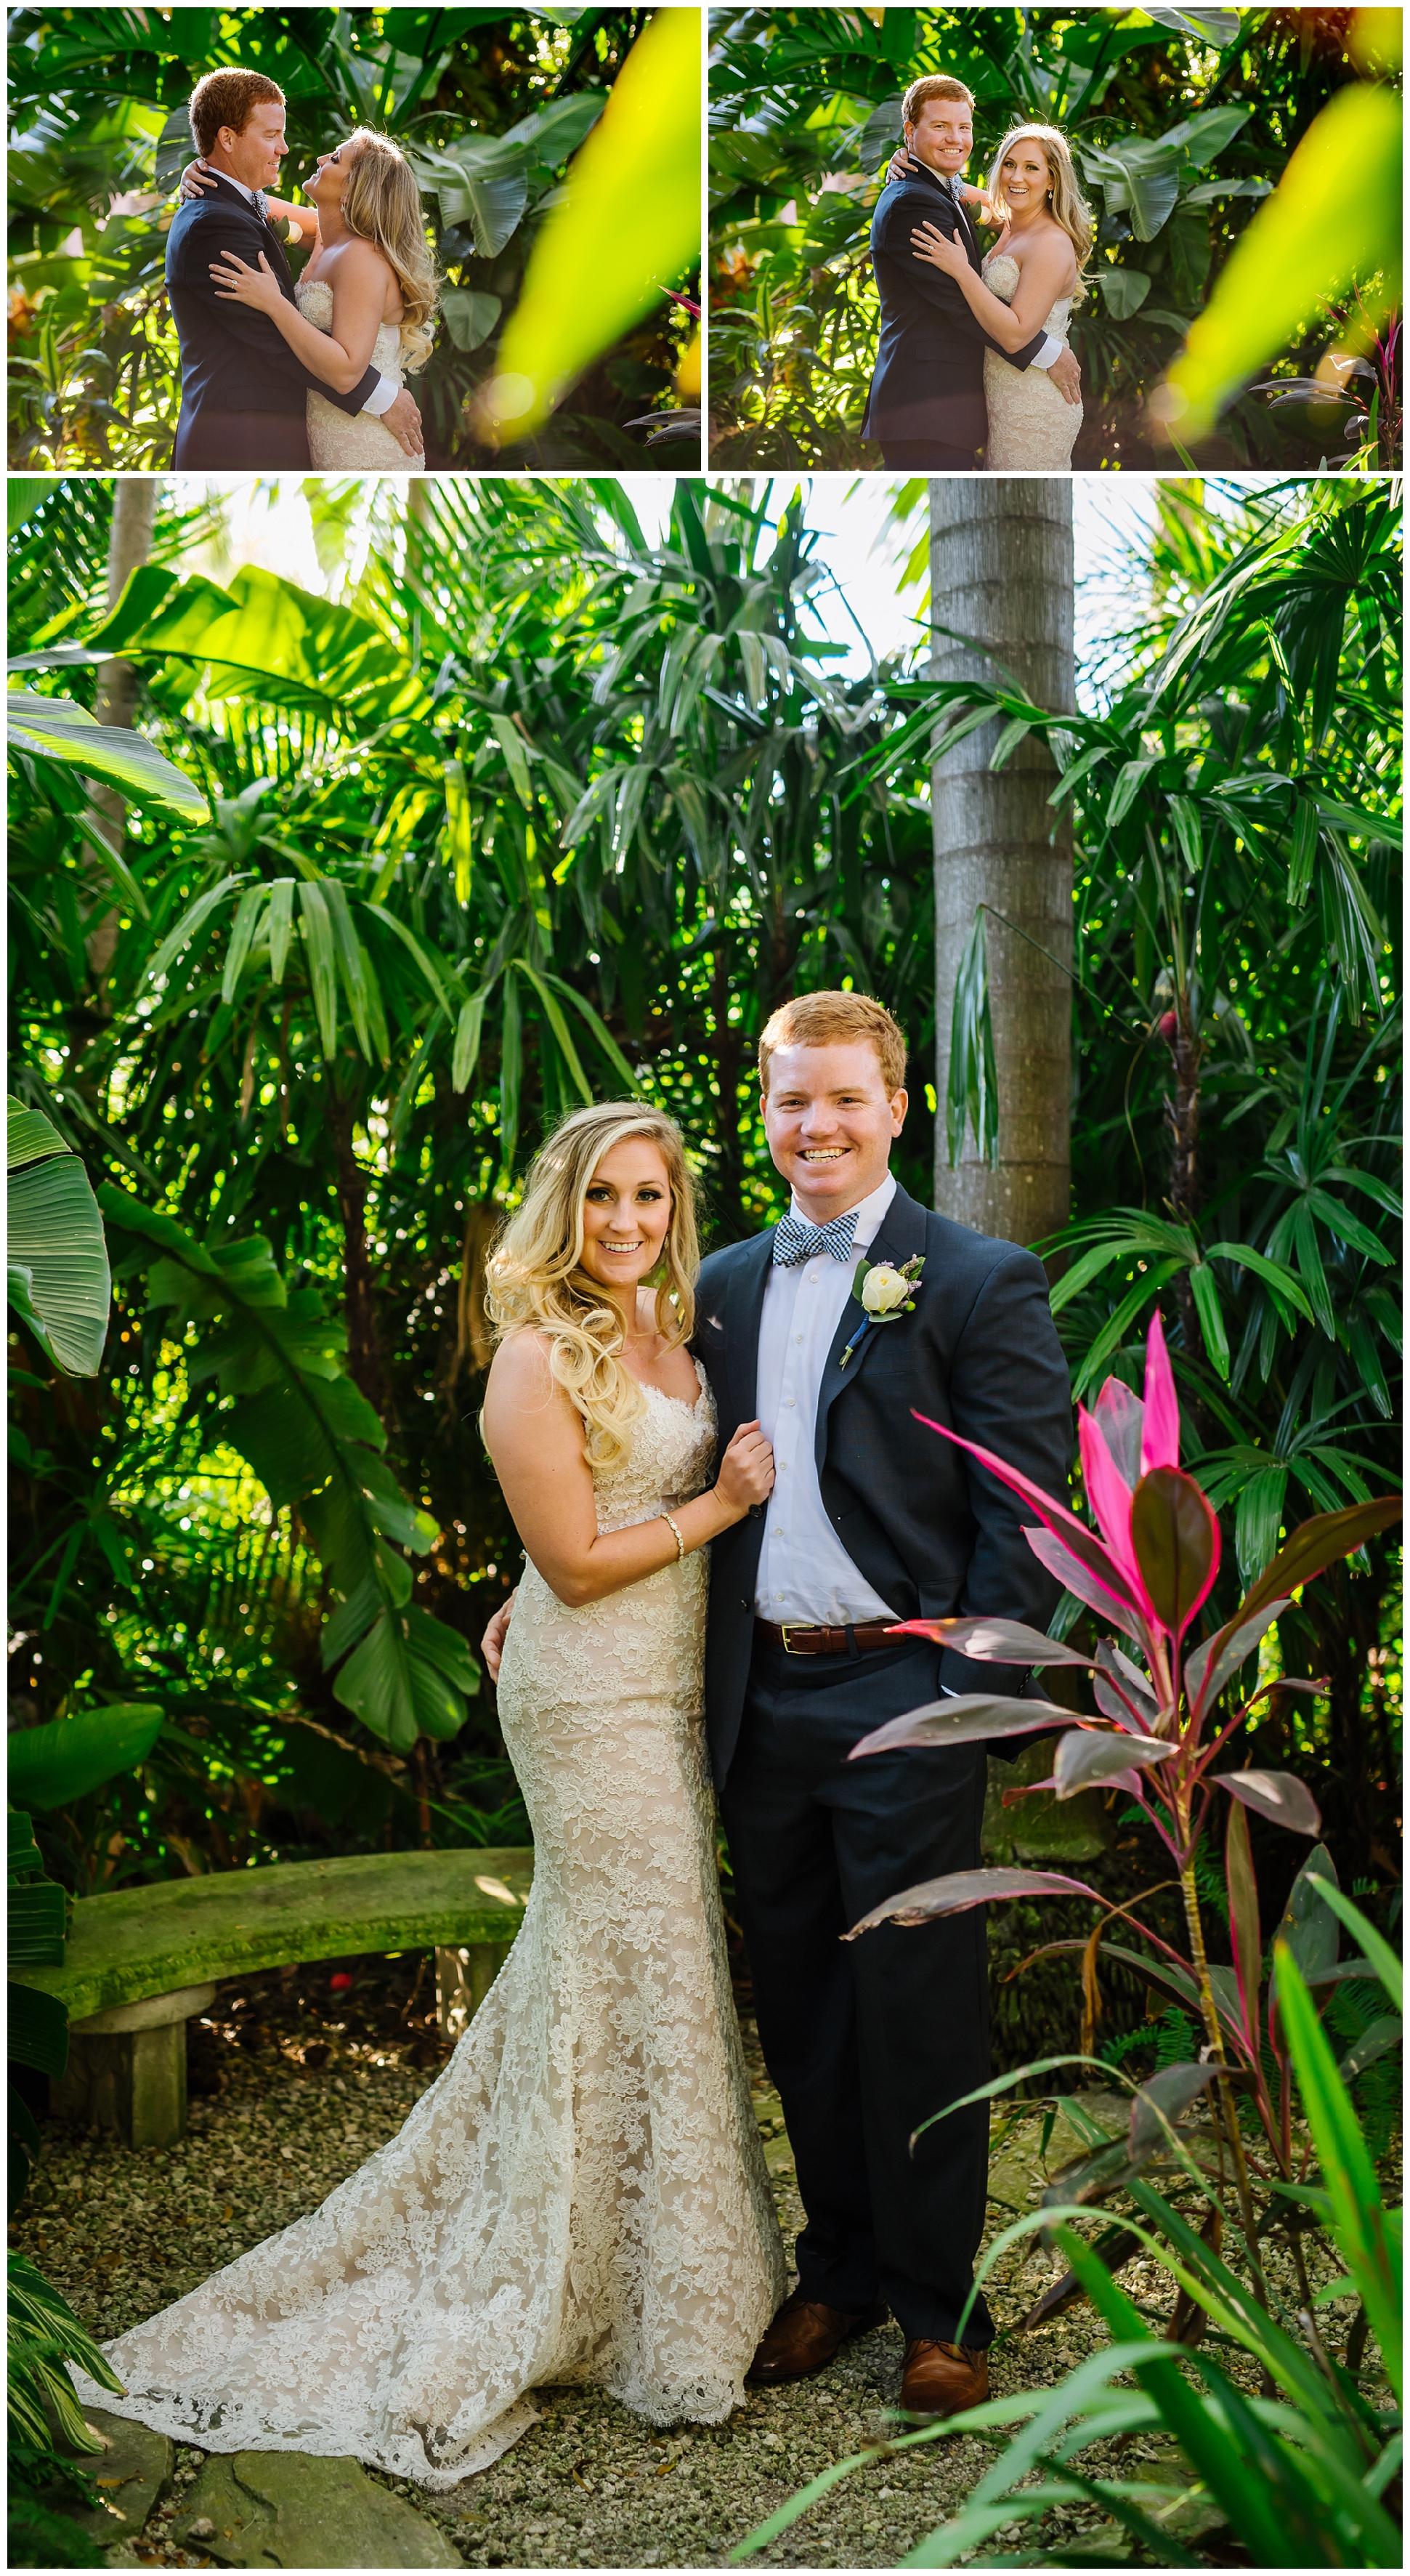 St-pete-wedding-photographer-grand-ballroom-vinoy-tea-garden-greek-luxury_0132.jpg